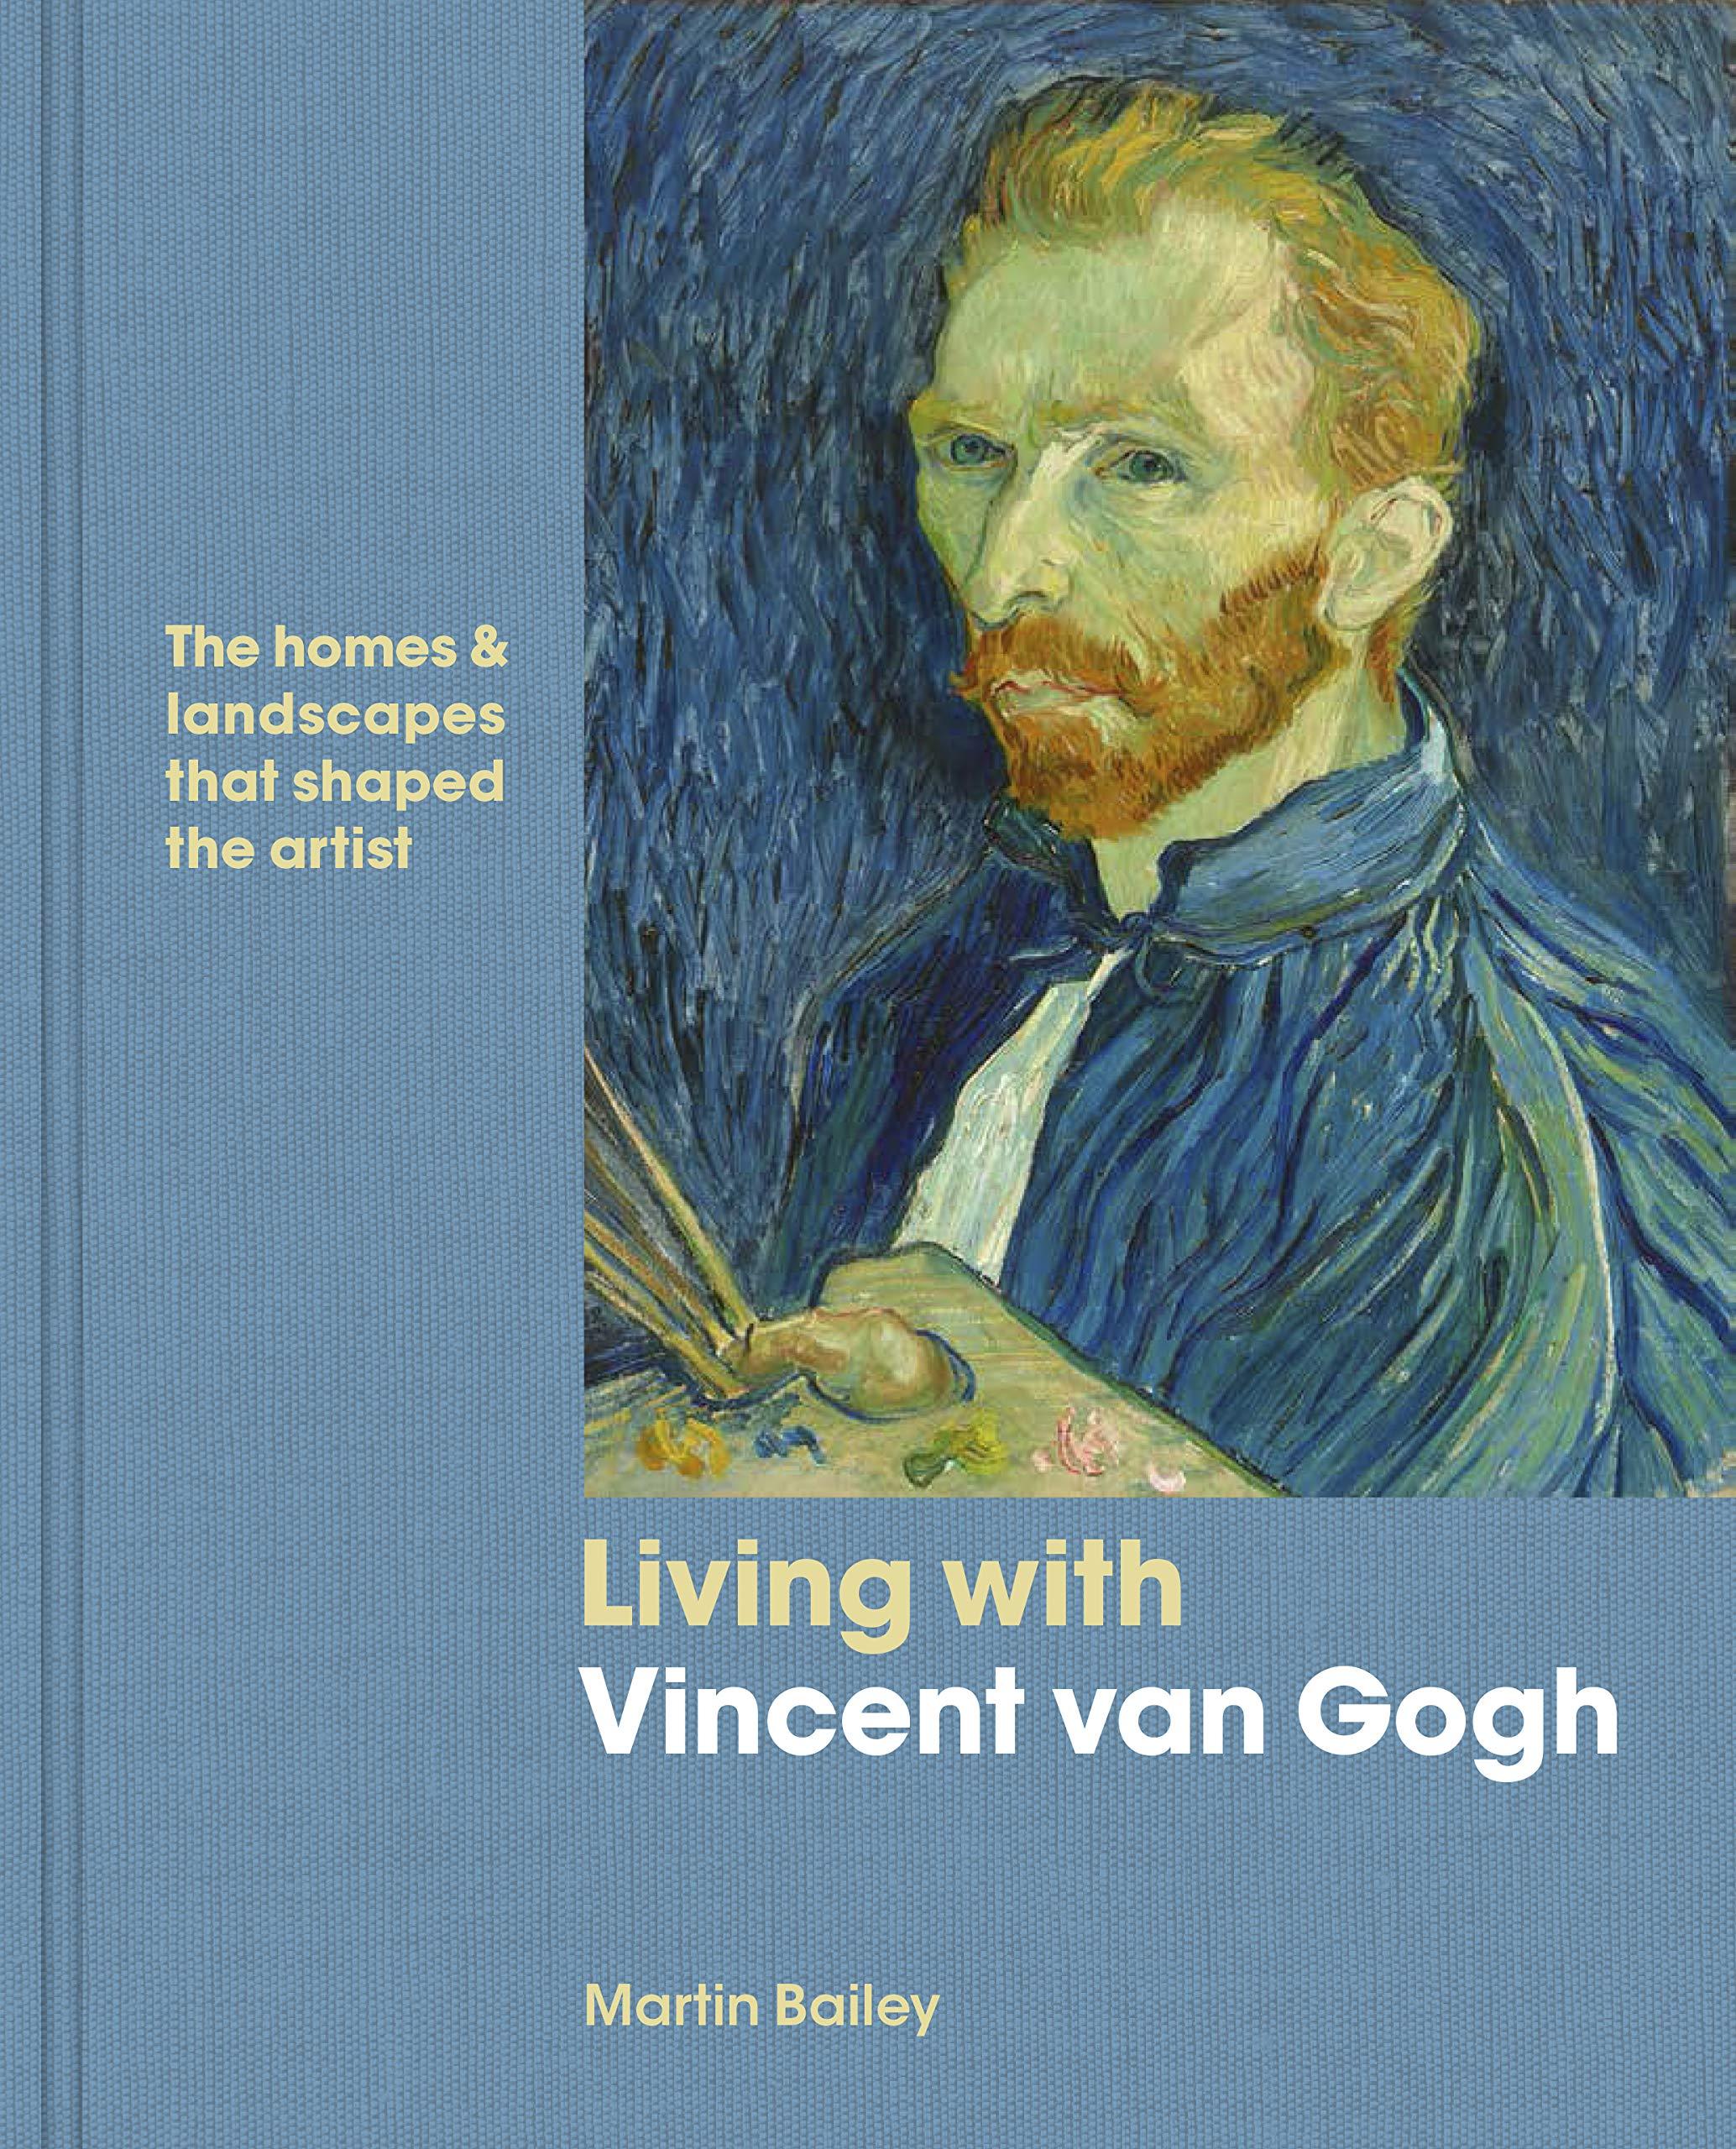 https://www.amazon.com/Vincent-van-Gogh-at-Home/dp/0711240183/ref=sr_1_1?s=books&ie=UTF8&qid=1541451446&sr=1-1&keywords=van+gogh+at+home+martin+bailey